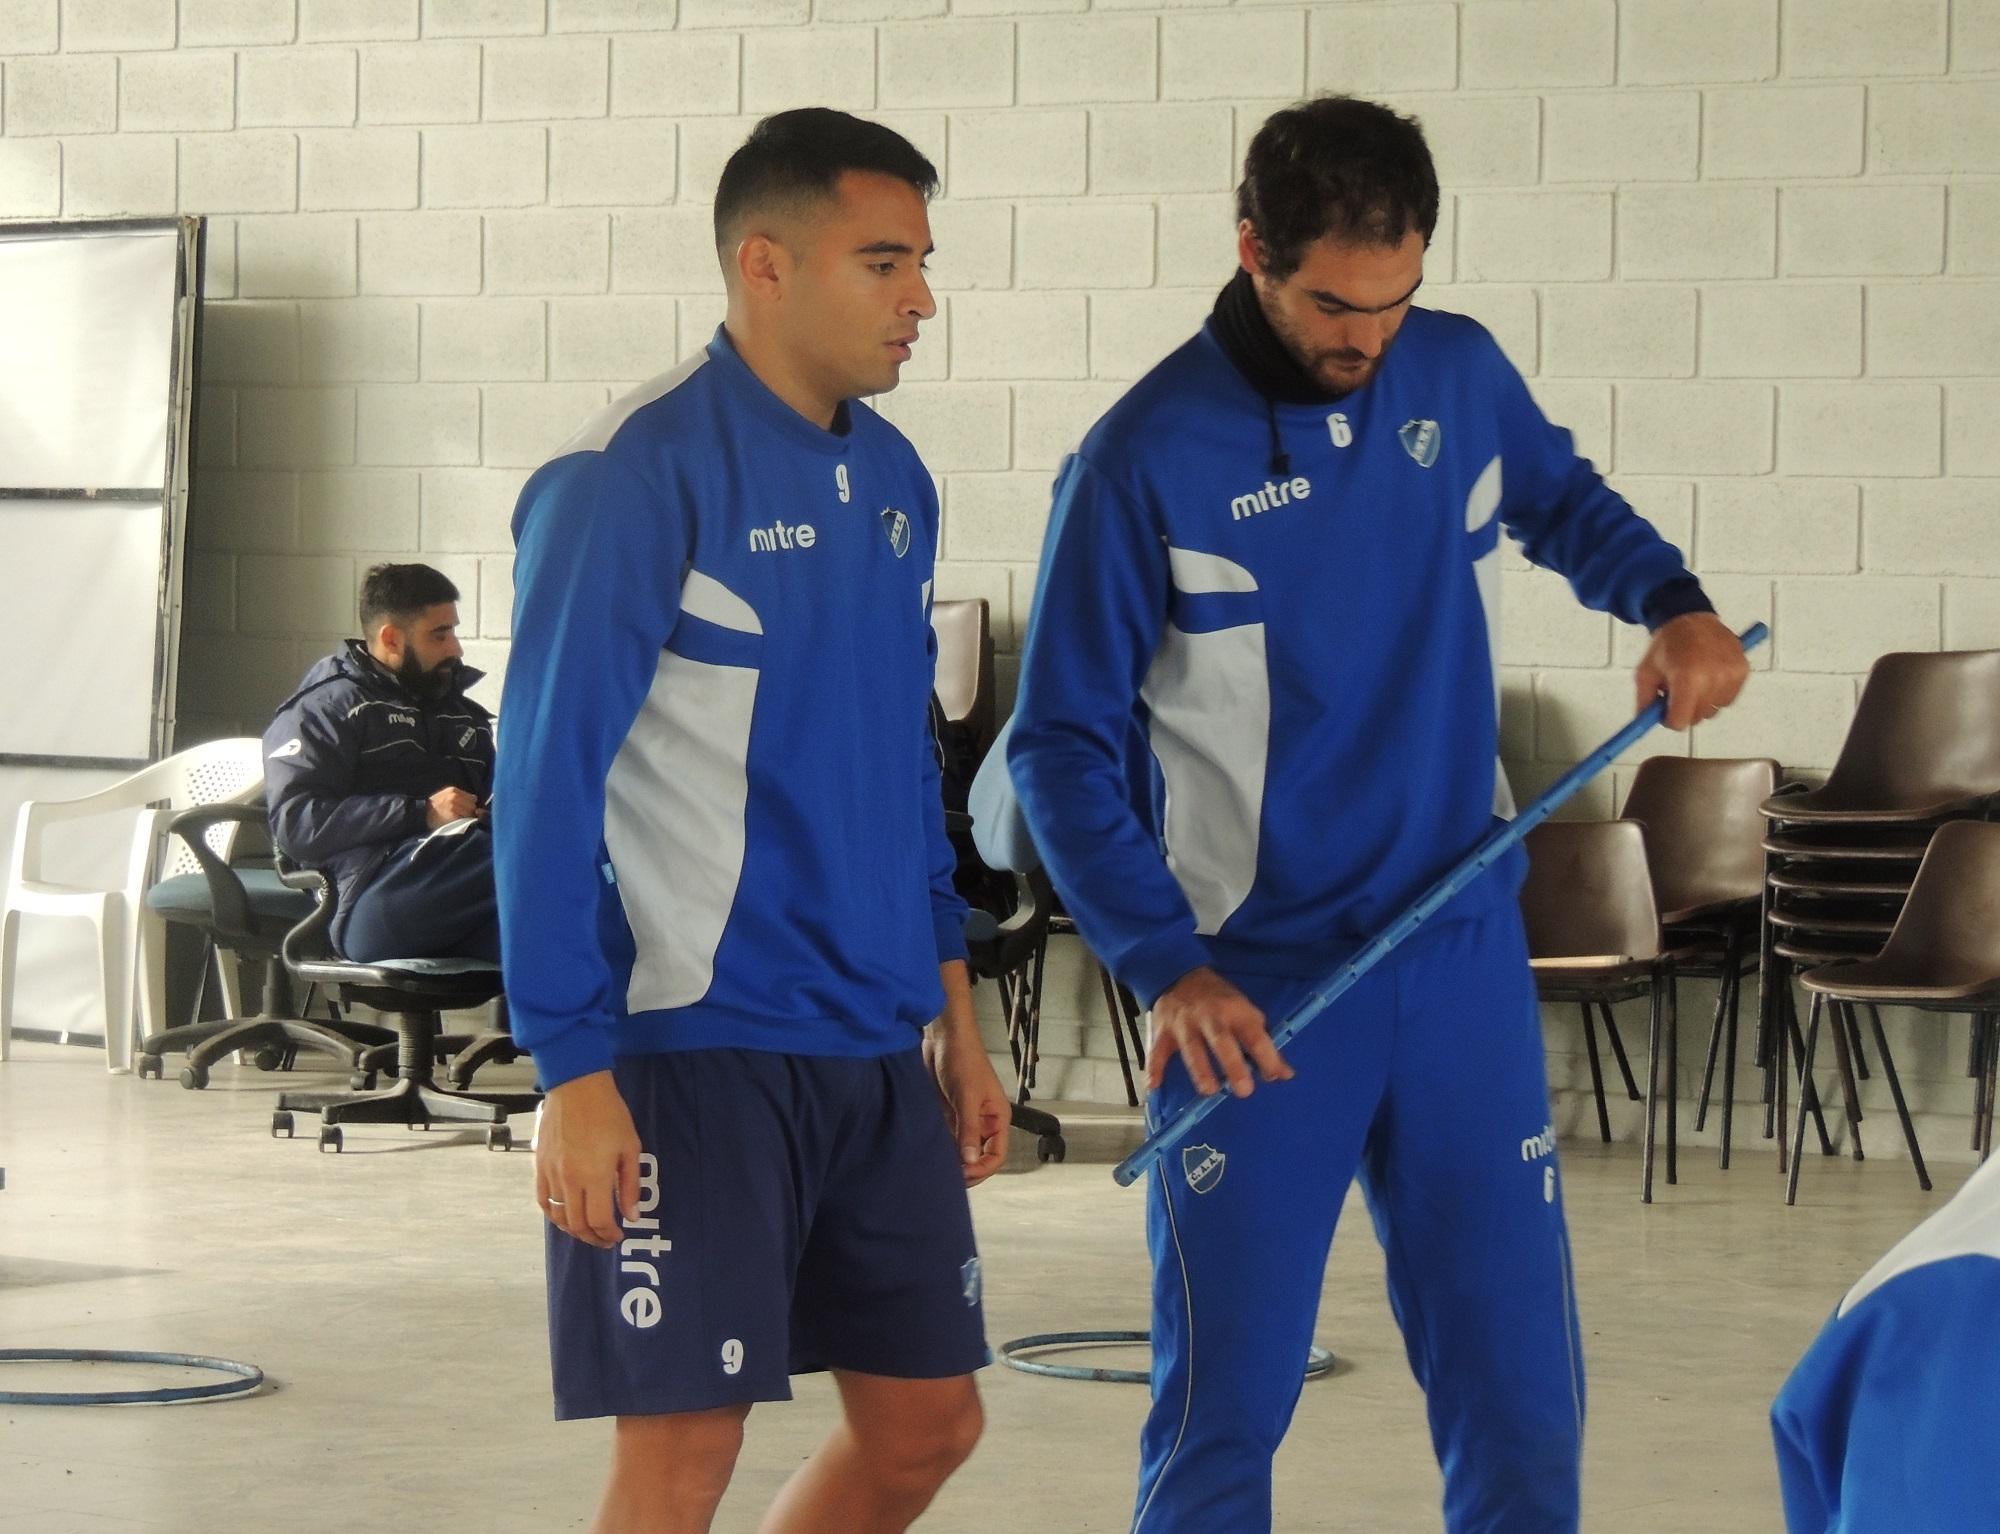 Francisco Molina ya entrena en Alvarado. (Foto: Prensa Alvarado)